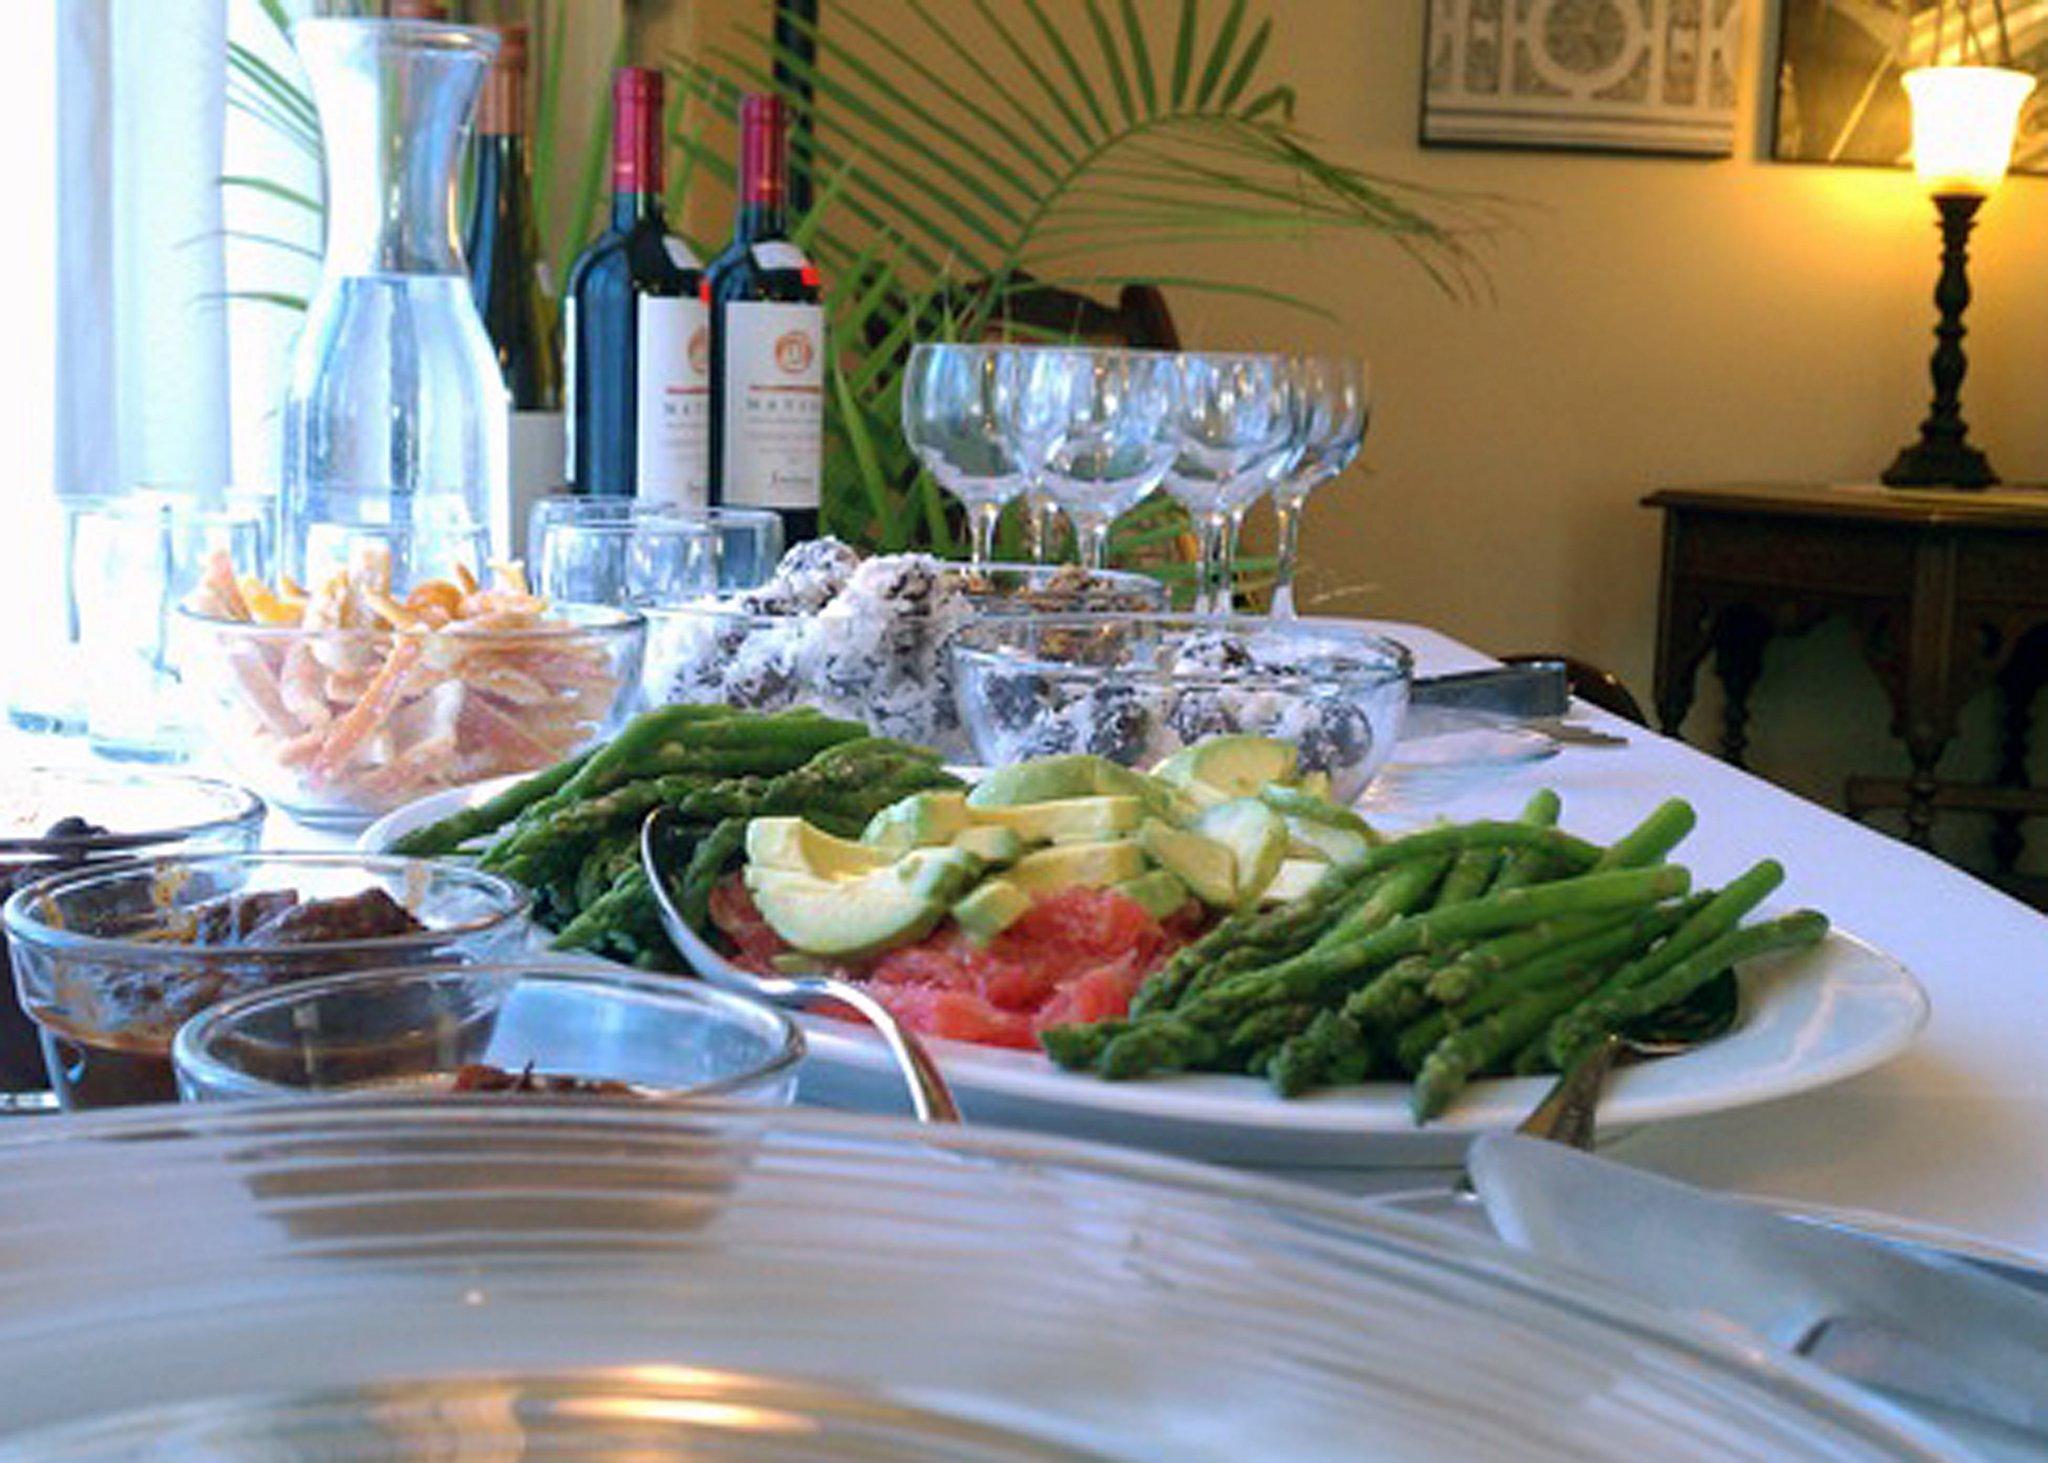 Recipe: Blanched Asparagus with Lemon-Dijon Vinaigrette - The Tender ...